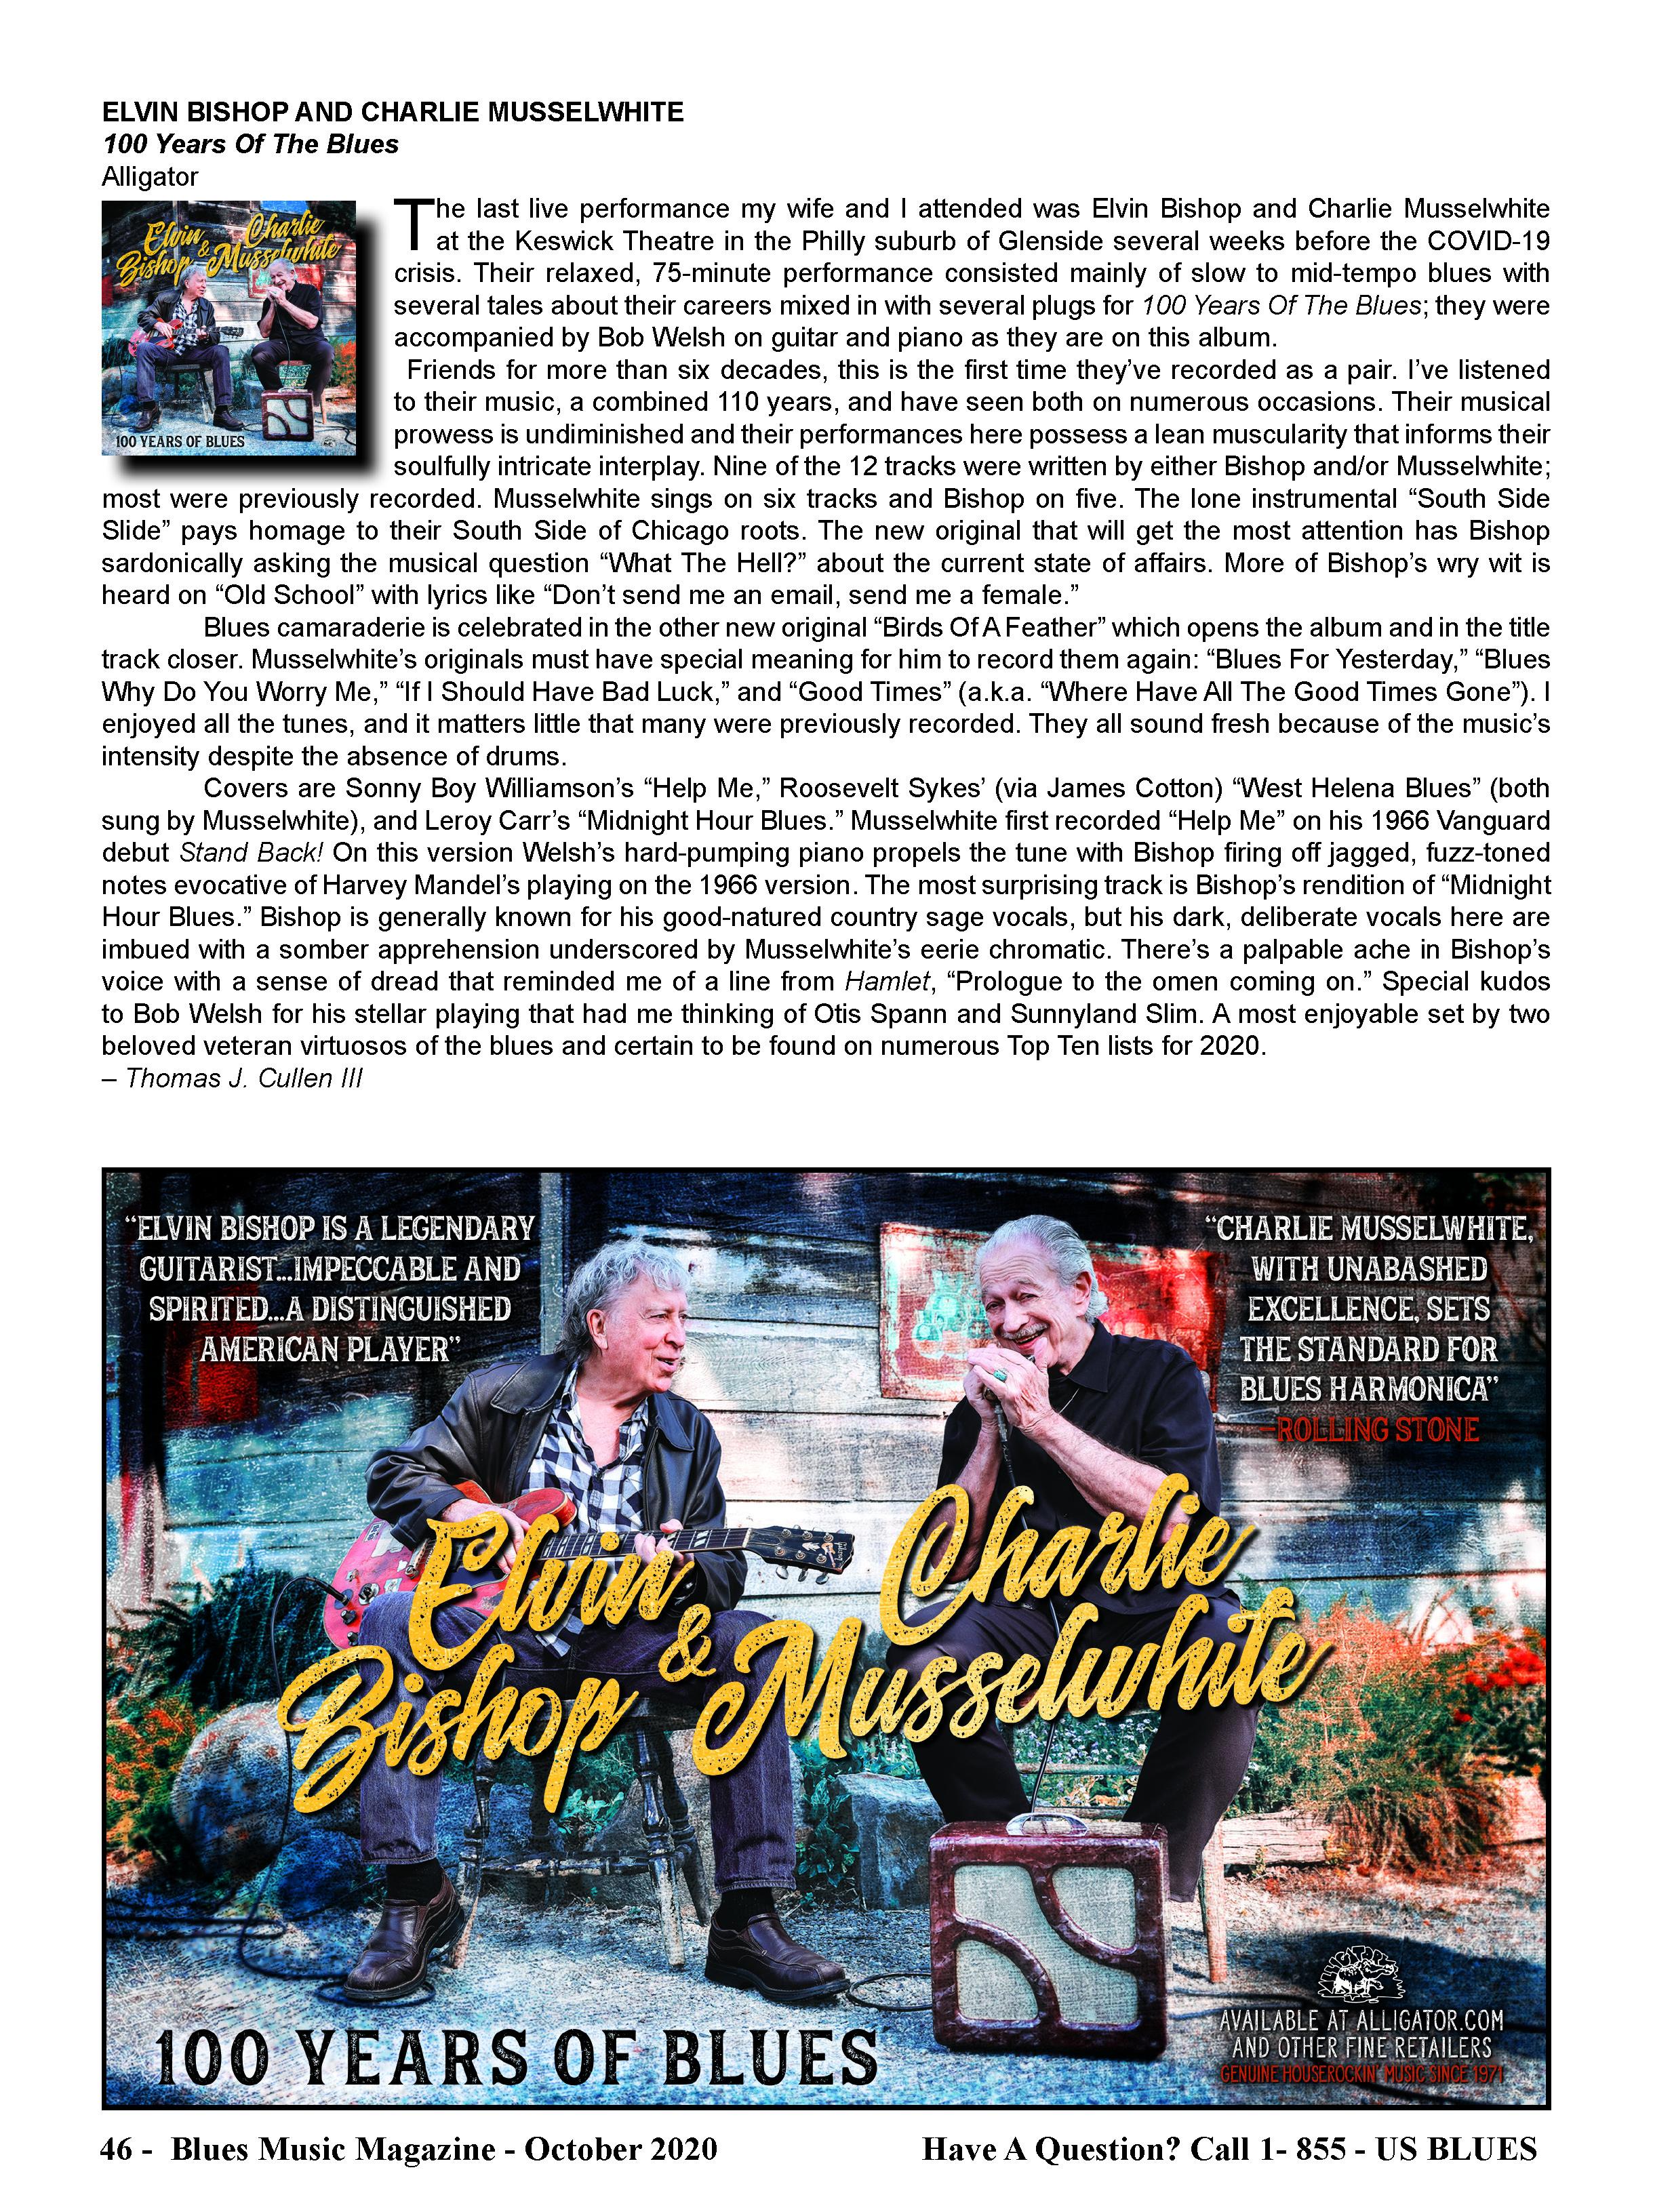 blues-music-magazine-fall-2020-2746.jpg